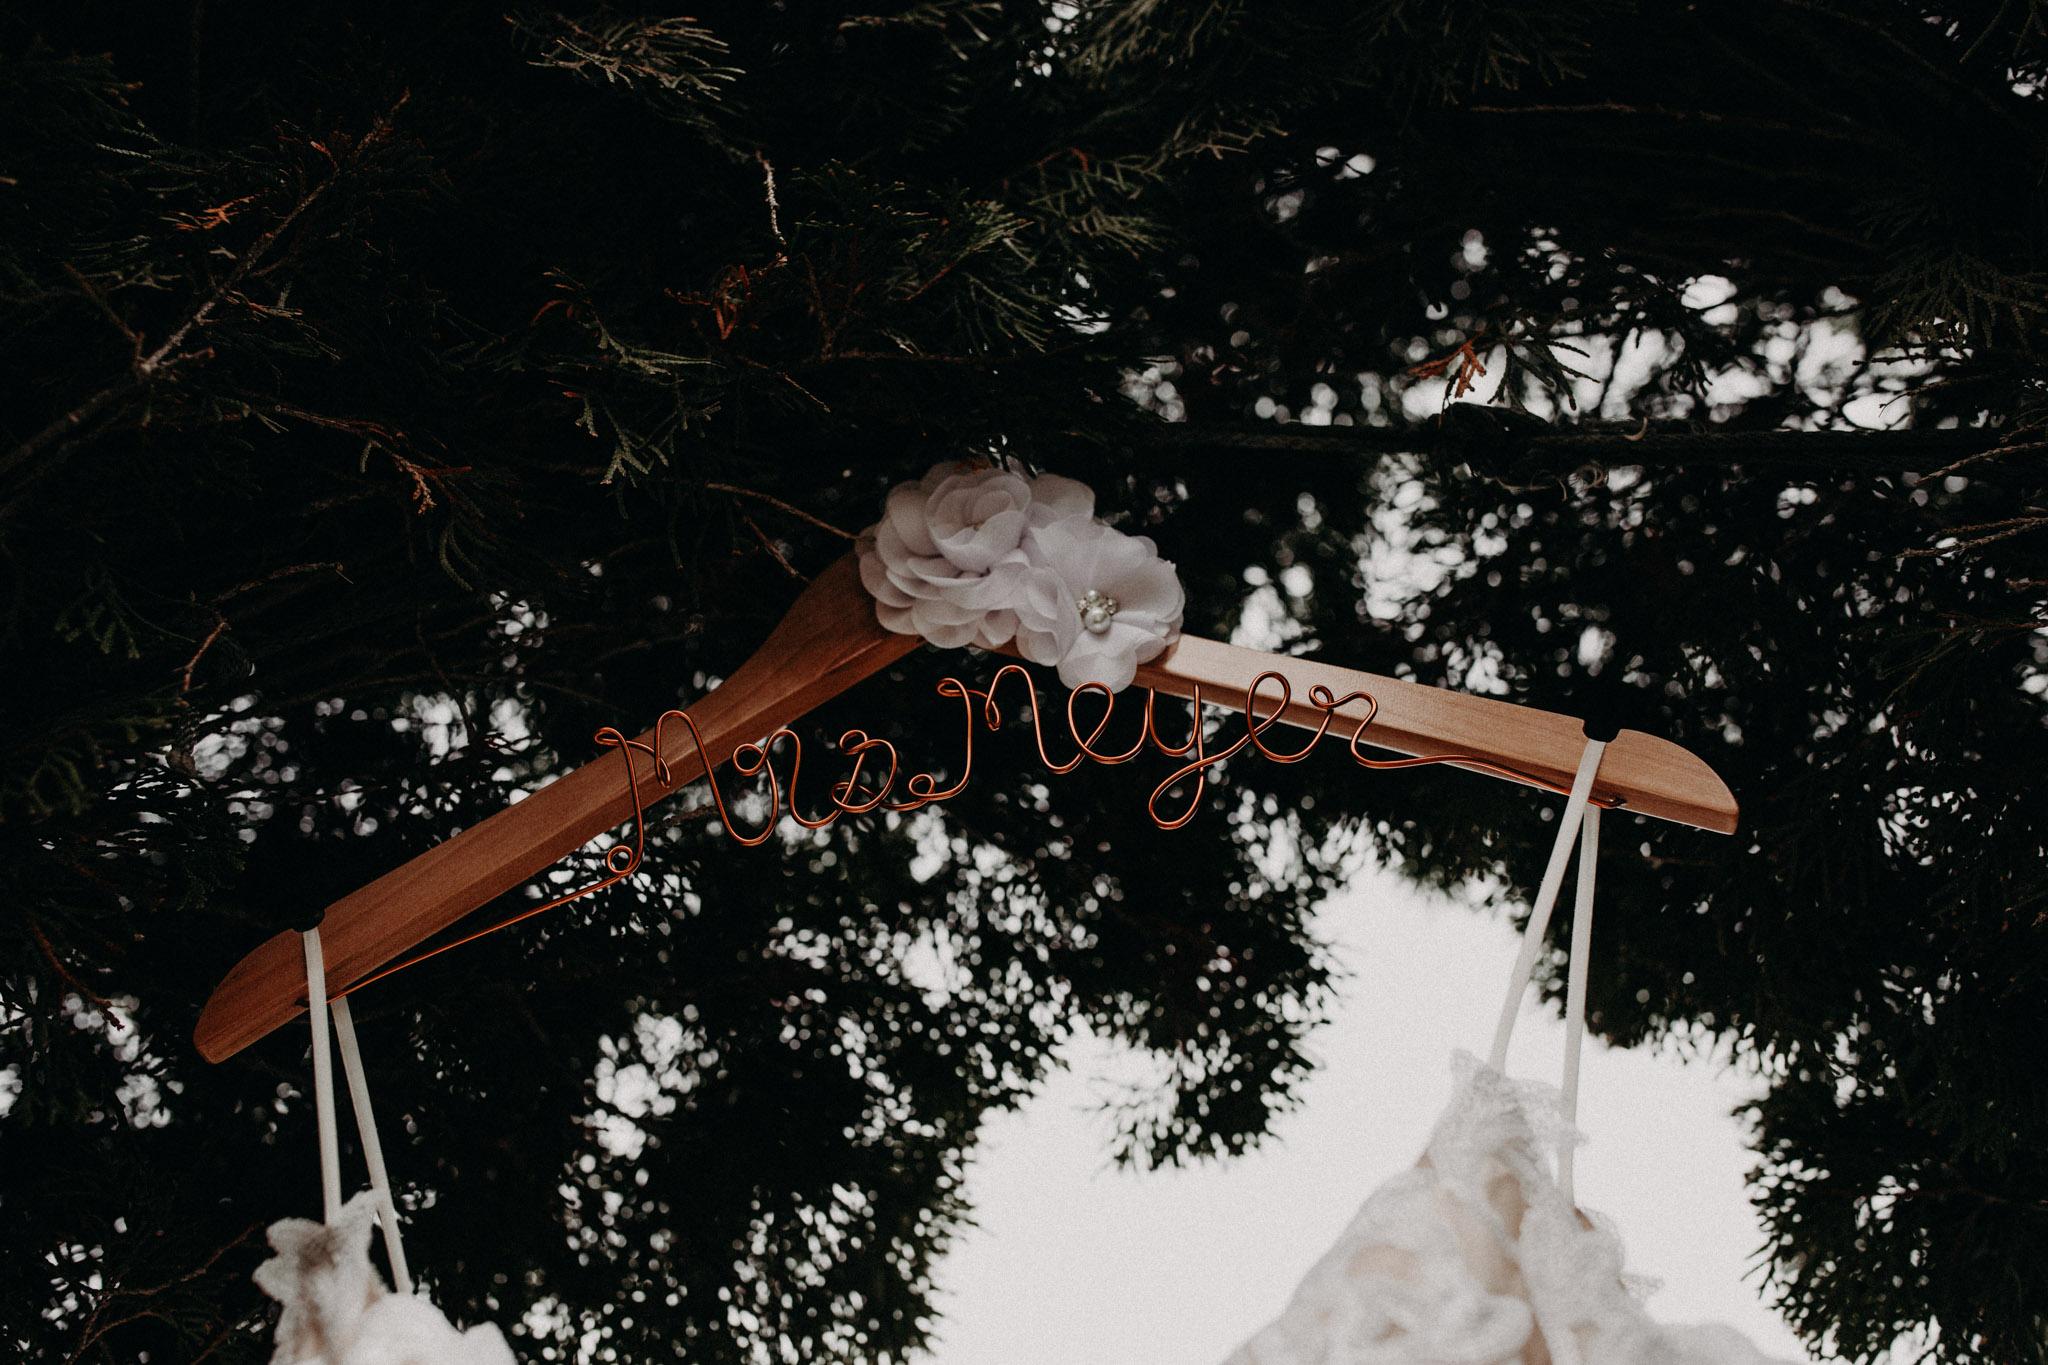 handmade wire bridal hanger that says Mrs. Meyer